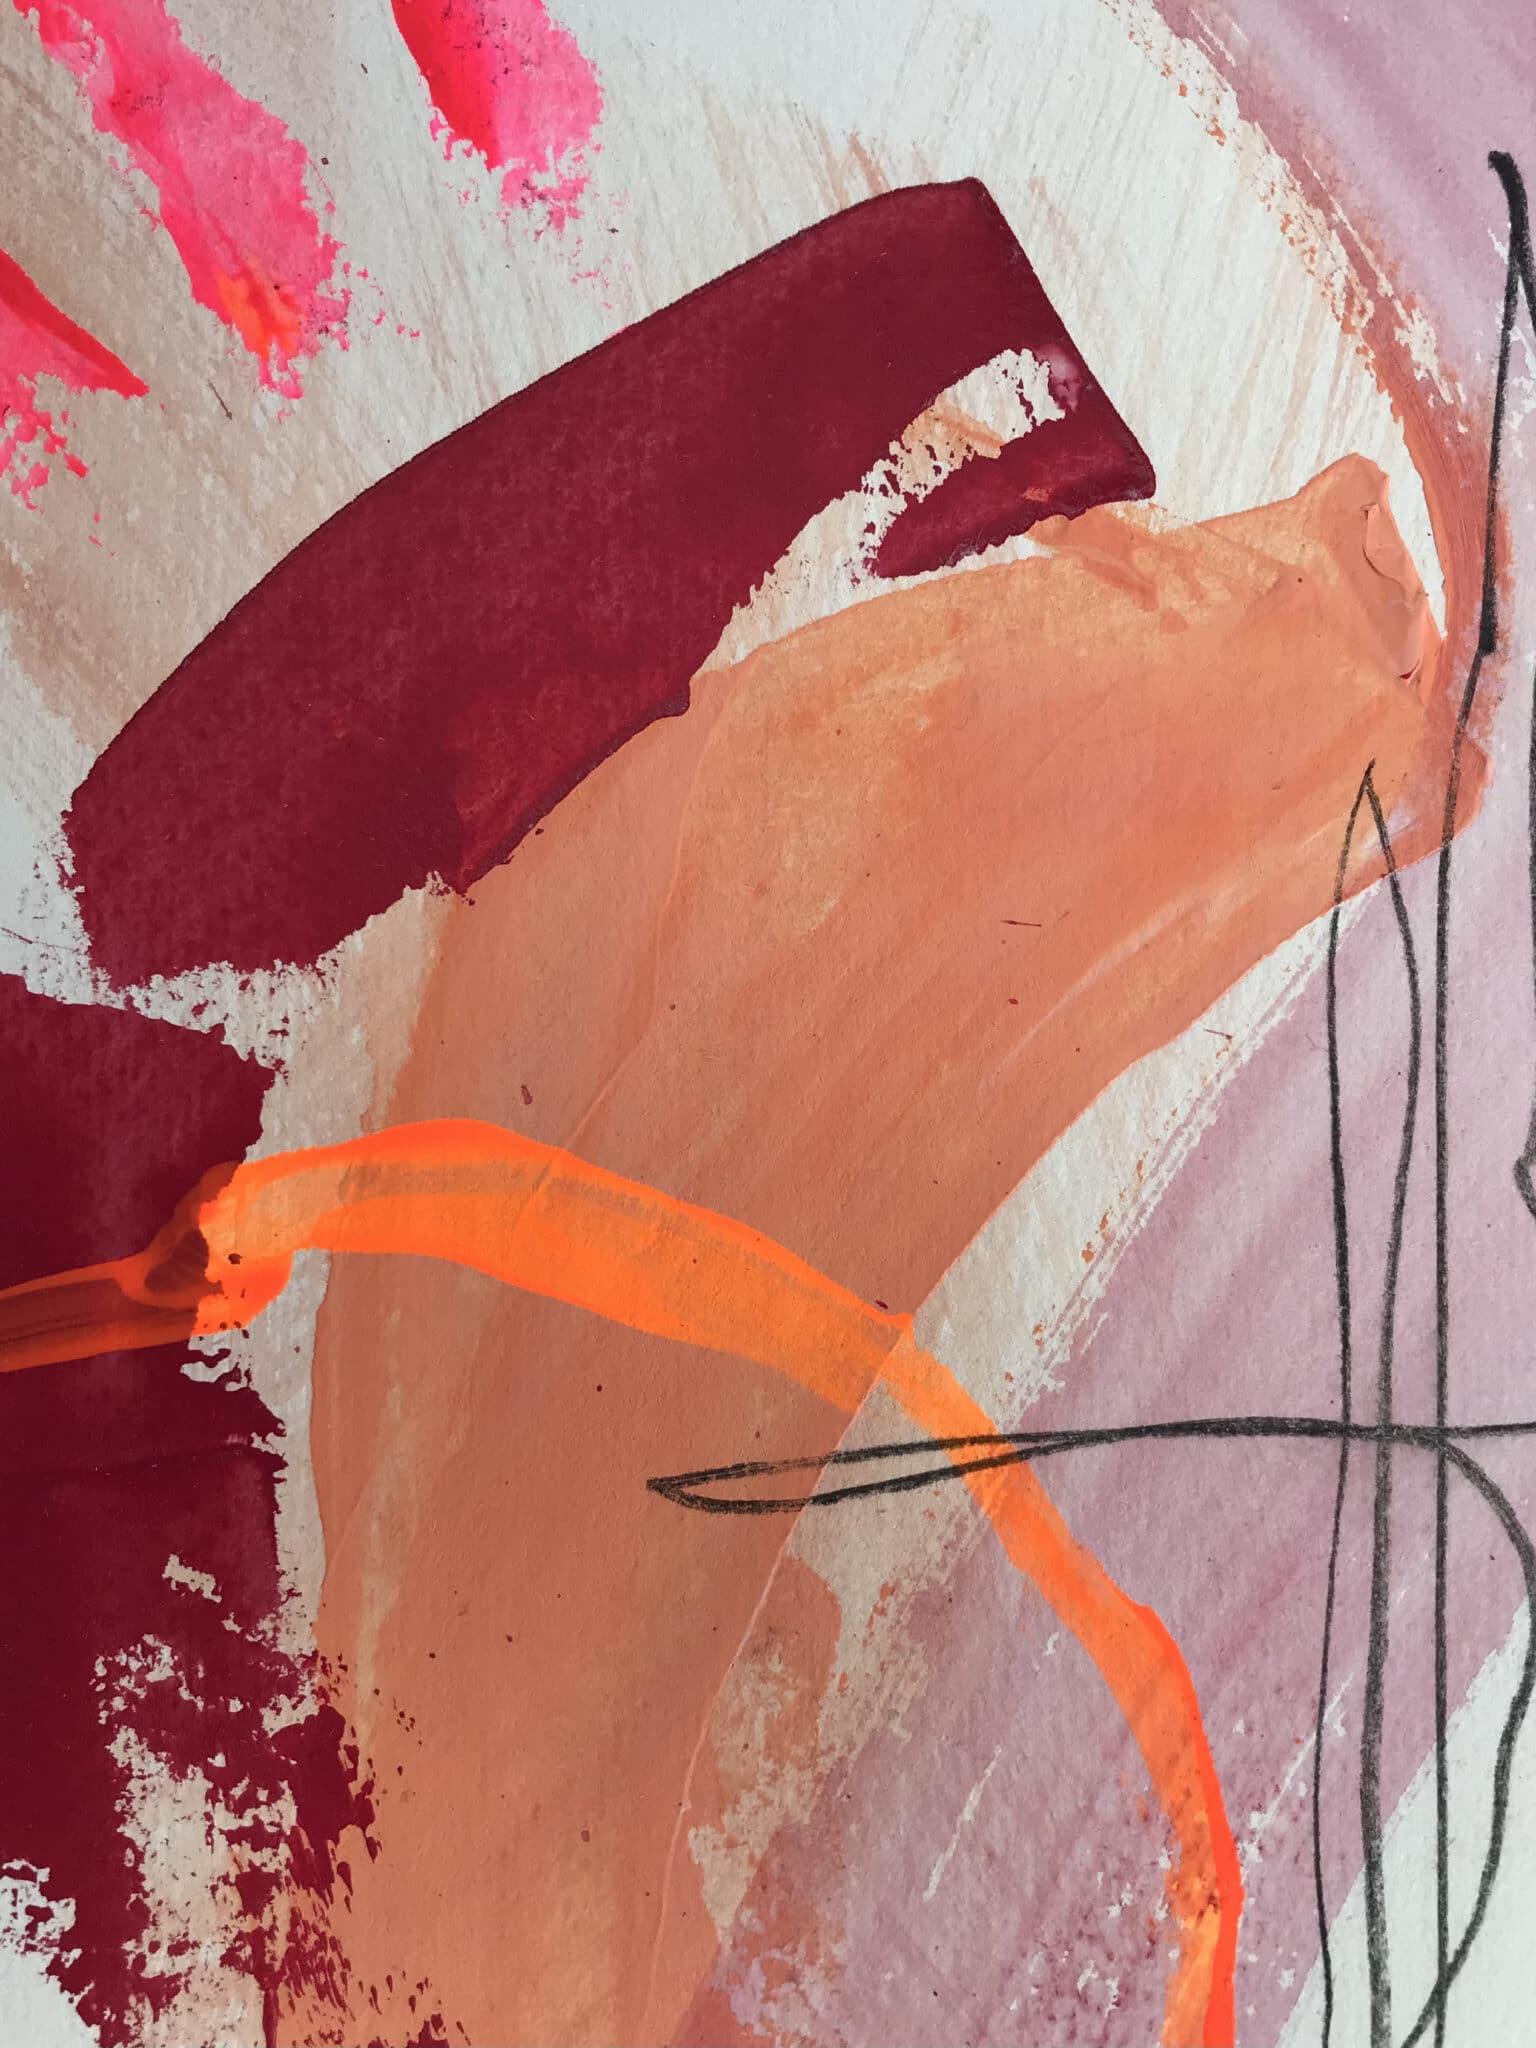 Colour & Shape 2 – Set Of 3 Mixed Media Artwork By Tish Willo Creative